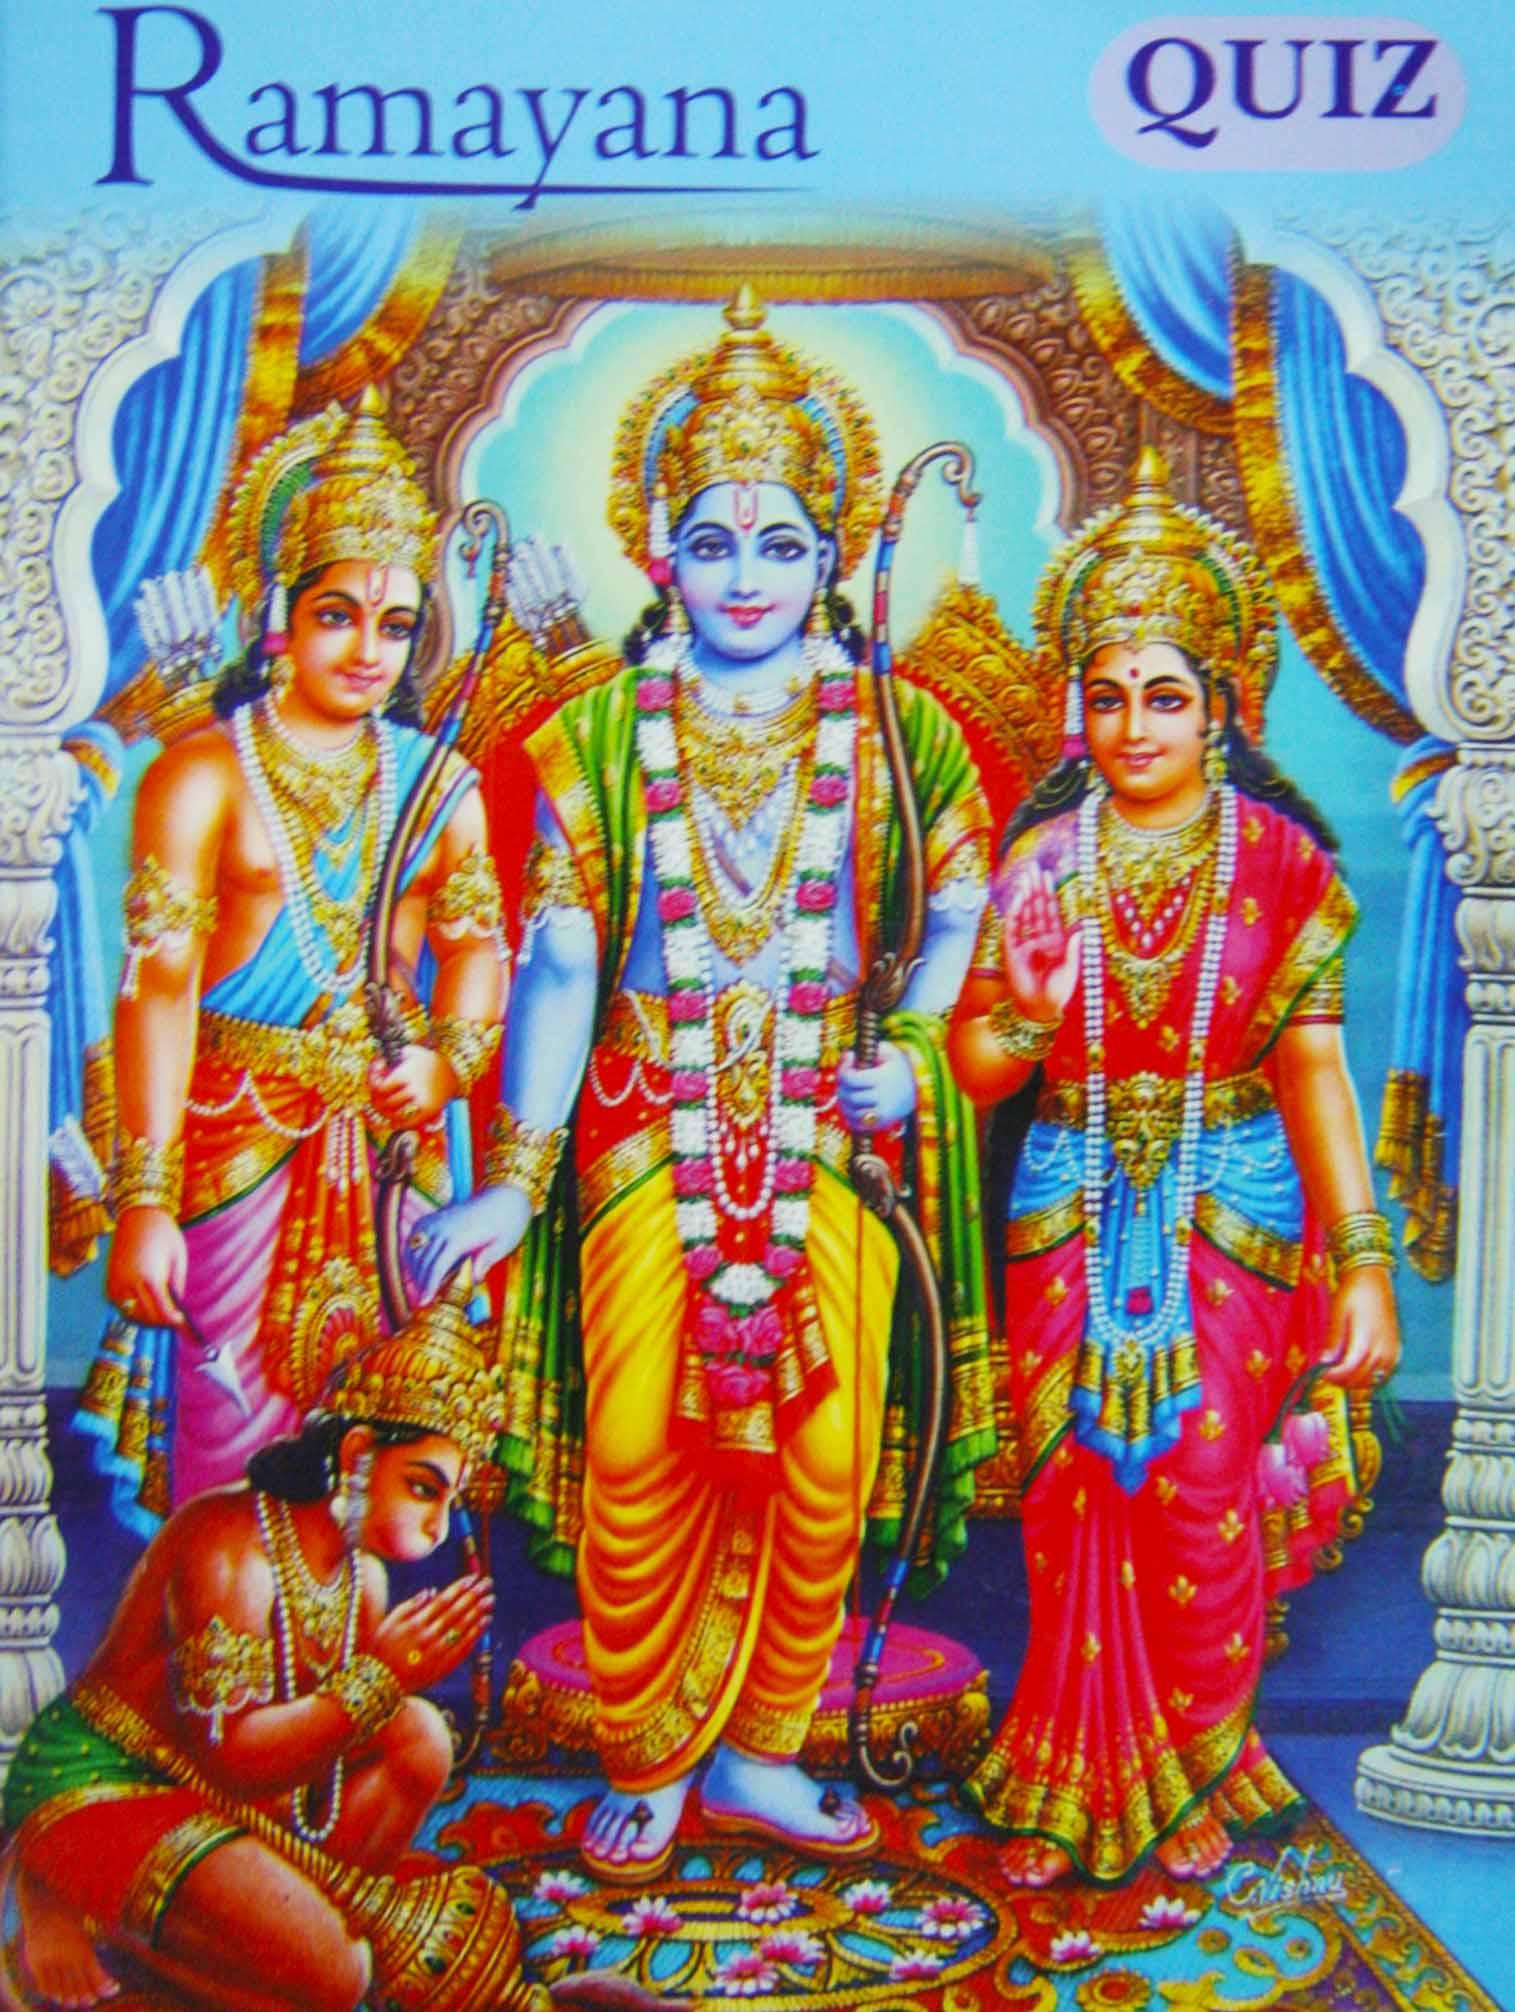 Quiz Ramayana Quiz Ramayana 978 81 7208 809 5 Rs